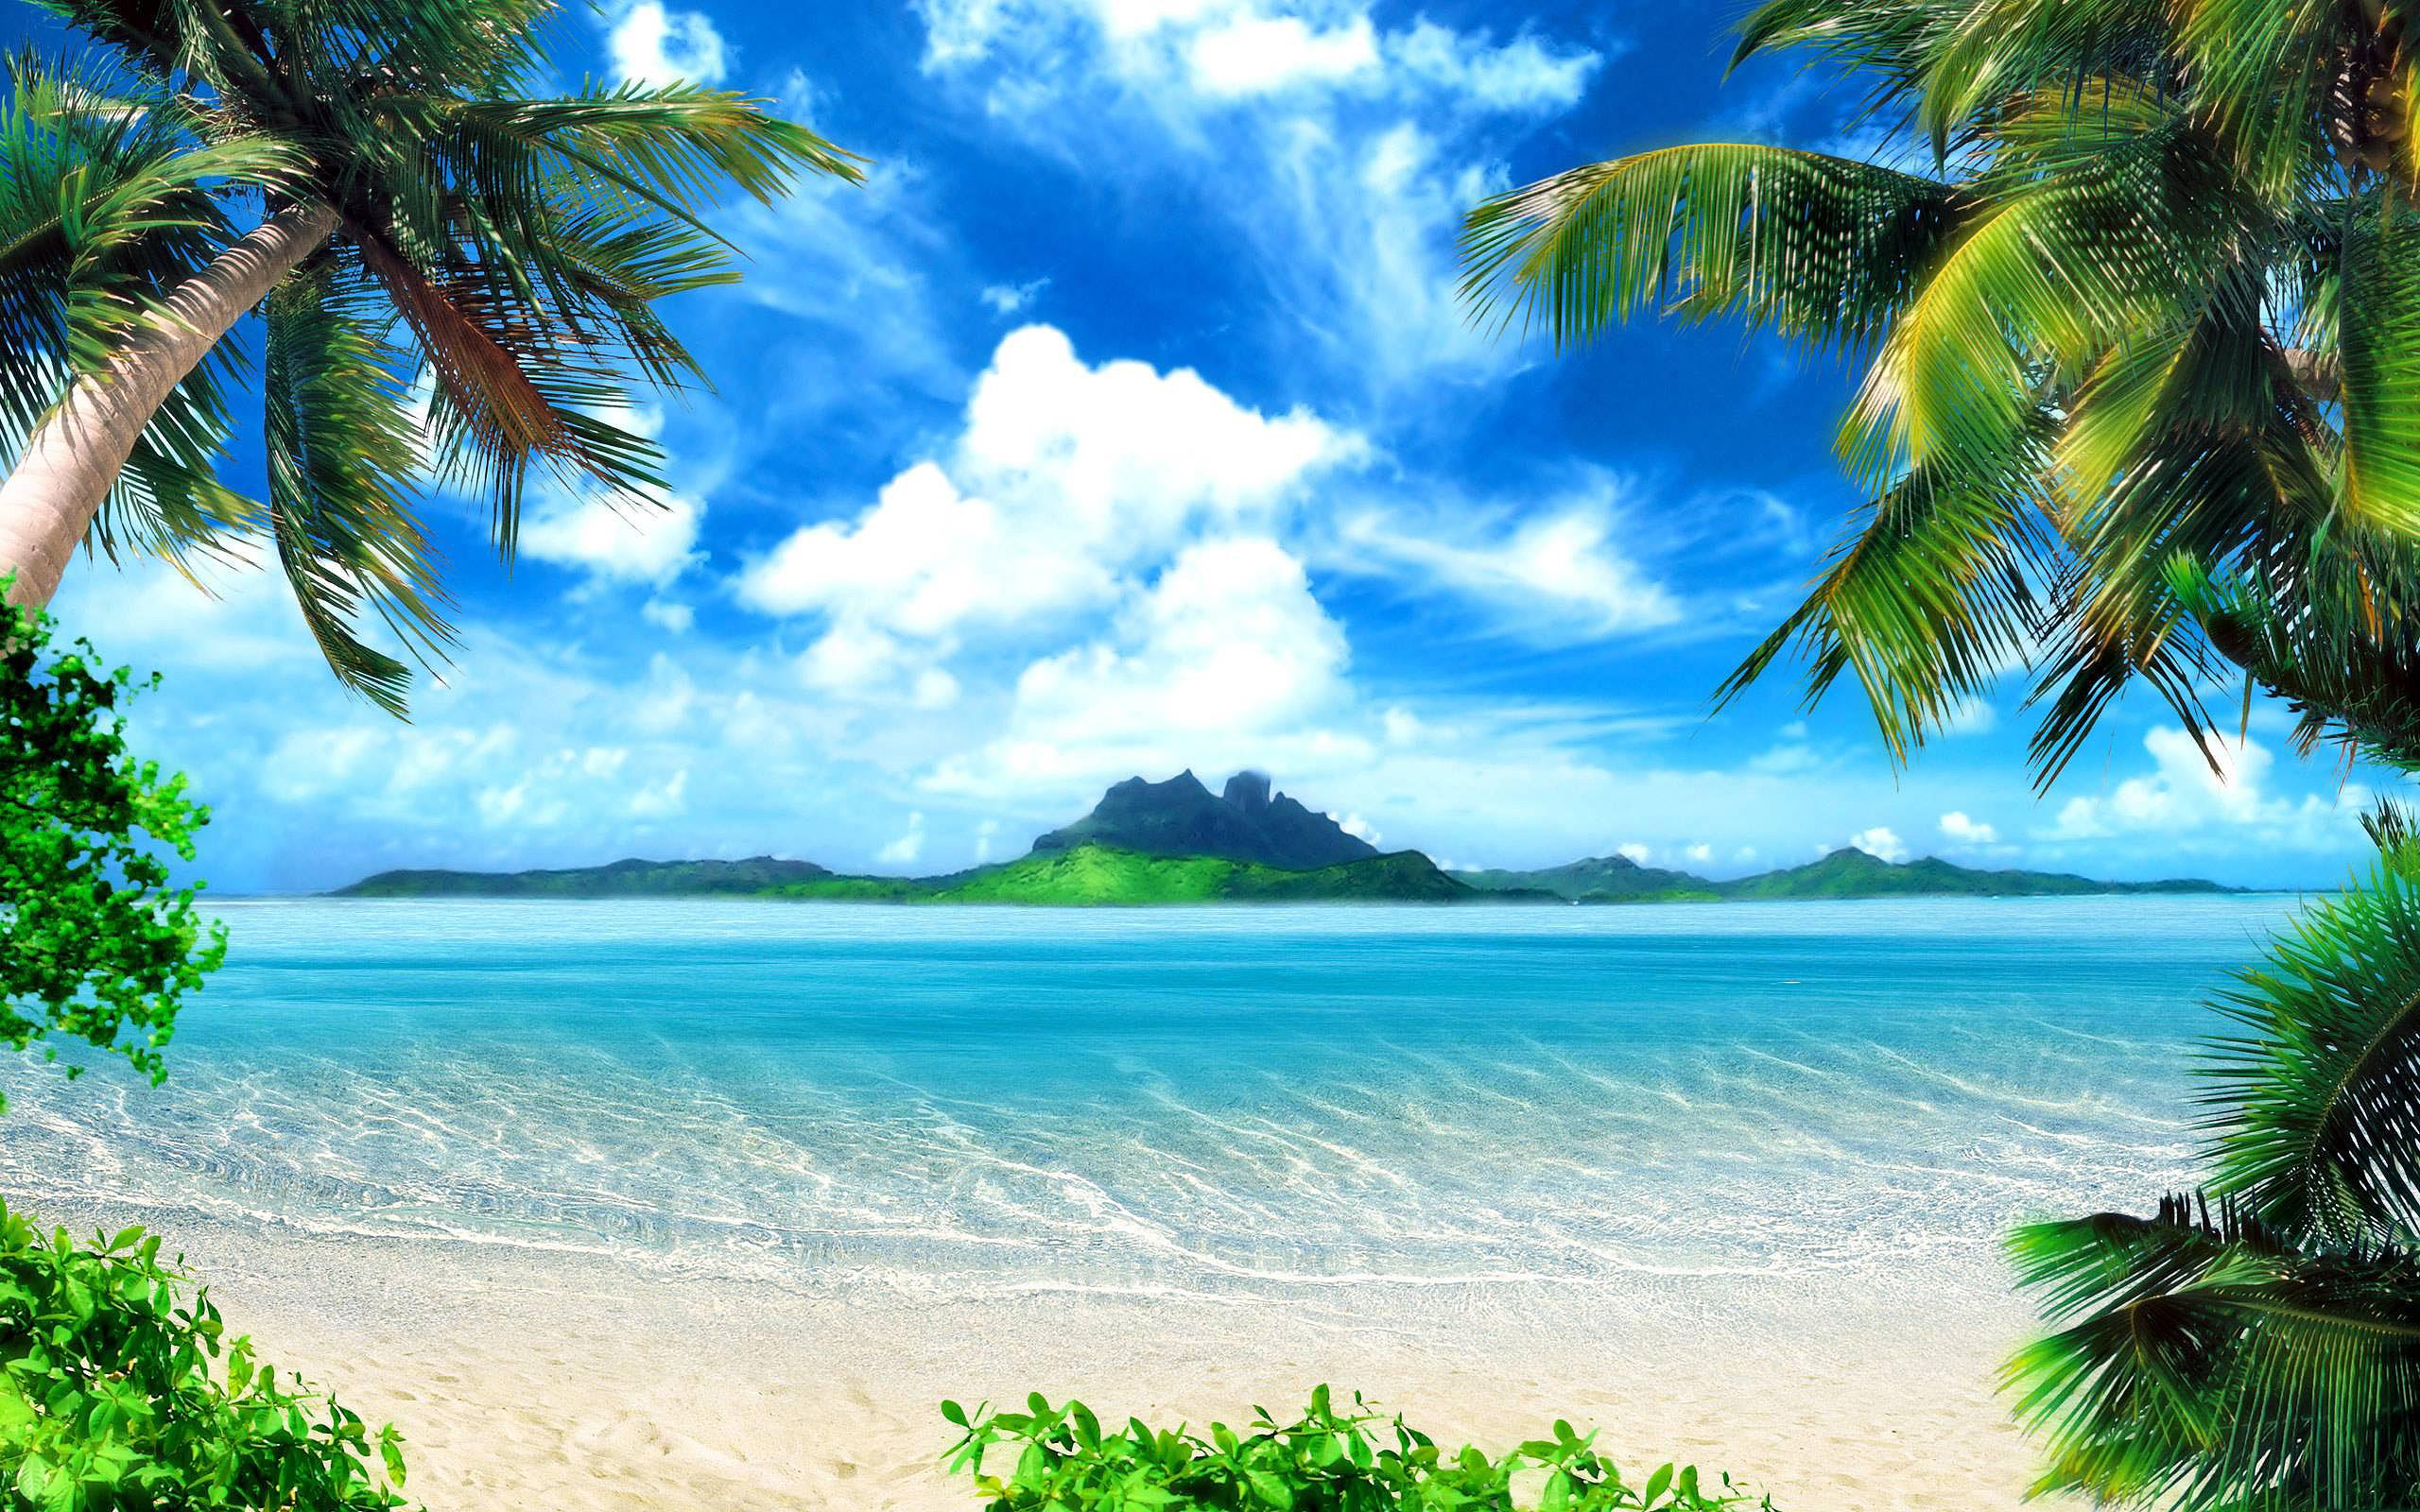 Tropical Beach Wallpaper wallpaper Tropical Beach Wallpaper hd 2560x1600